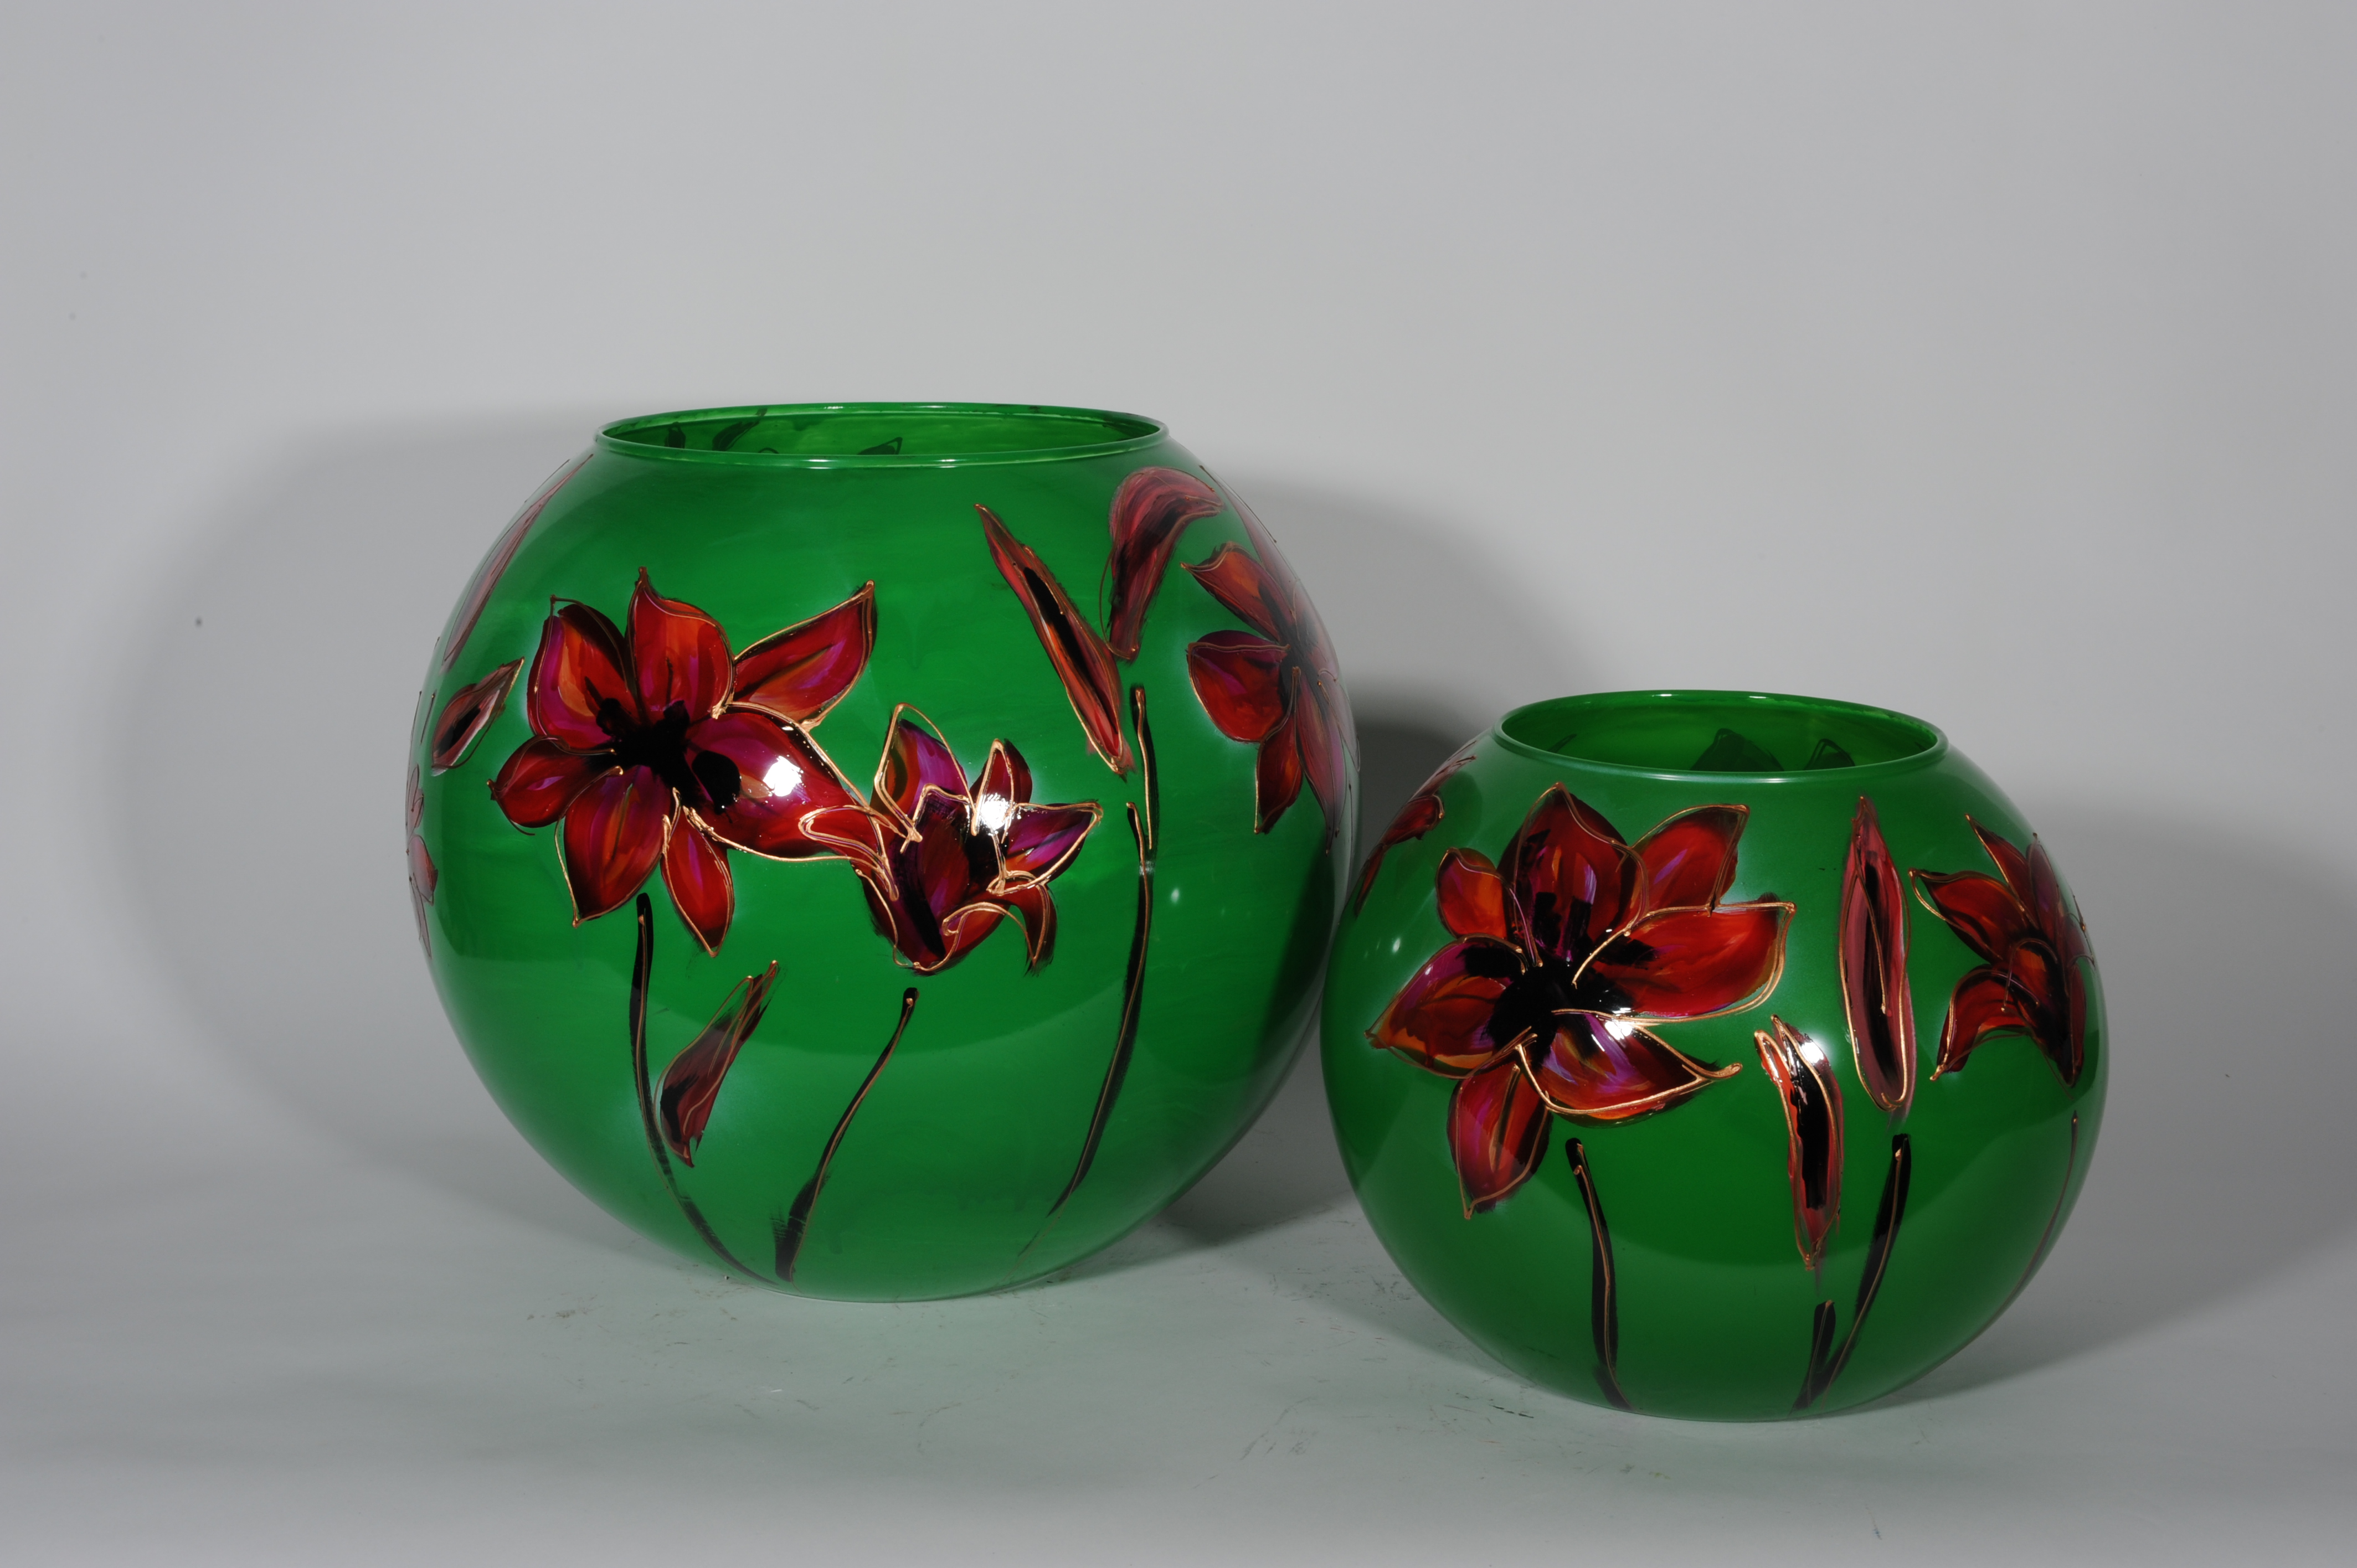 Lily groen bolvazen